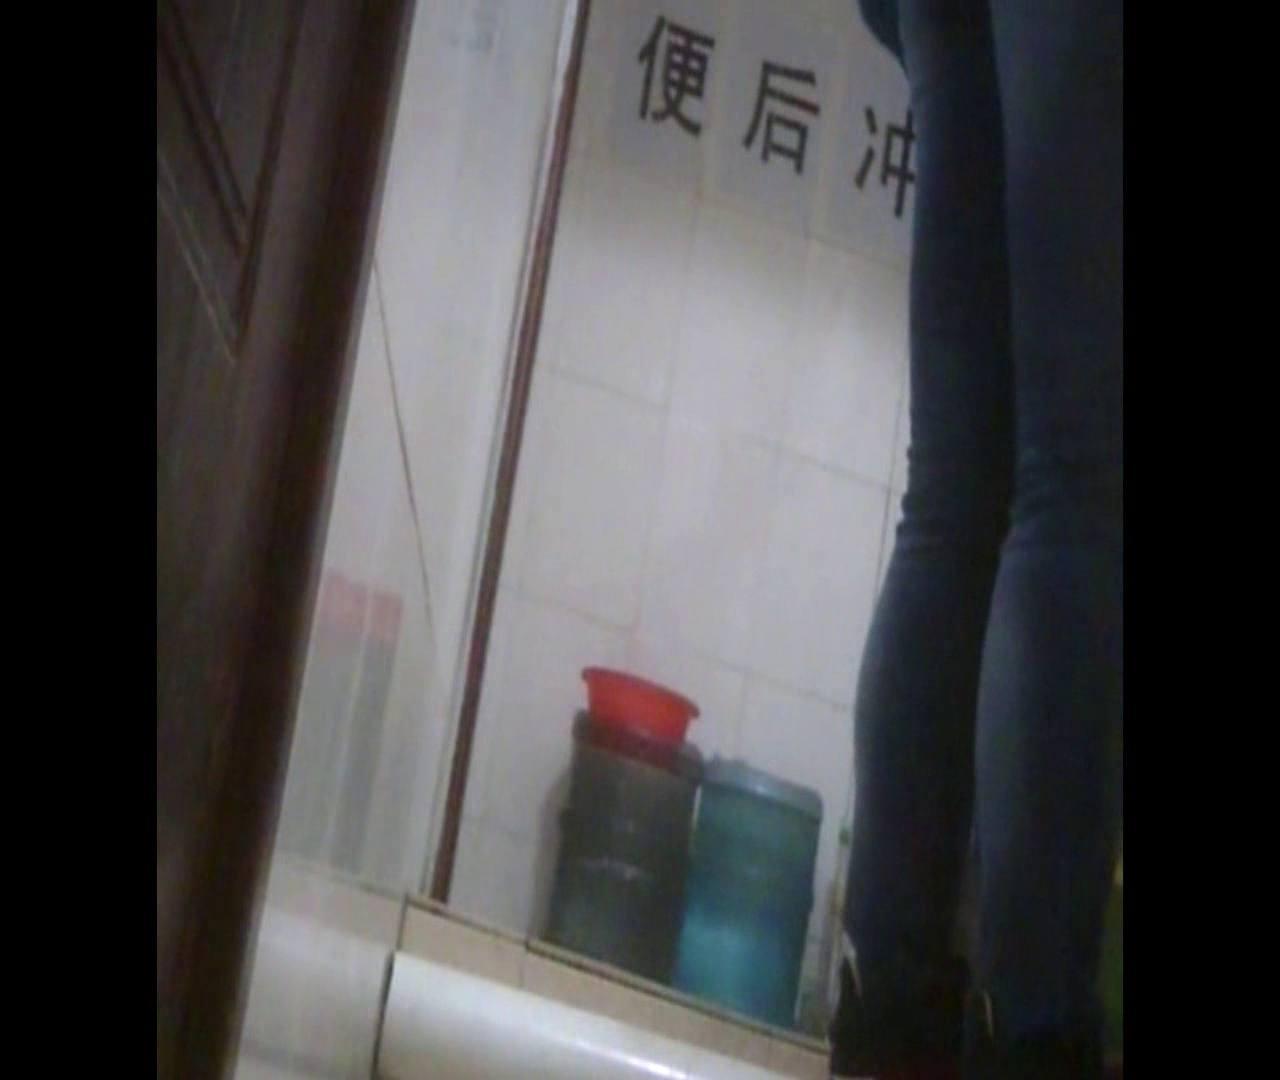 Vol.37 豊満な胸を持つマッシュルームカットな彼女 洗面所 盗撮おめこ無修正動画無料 60pic 14